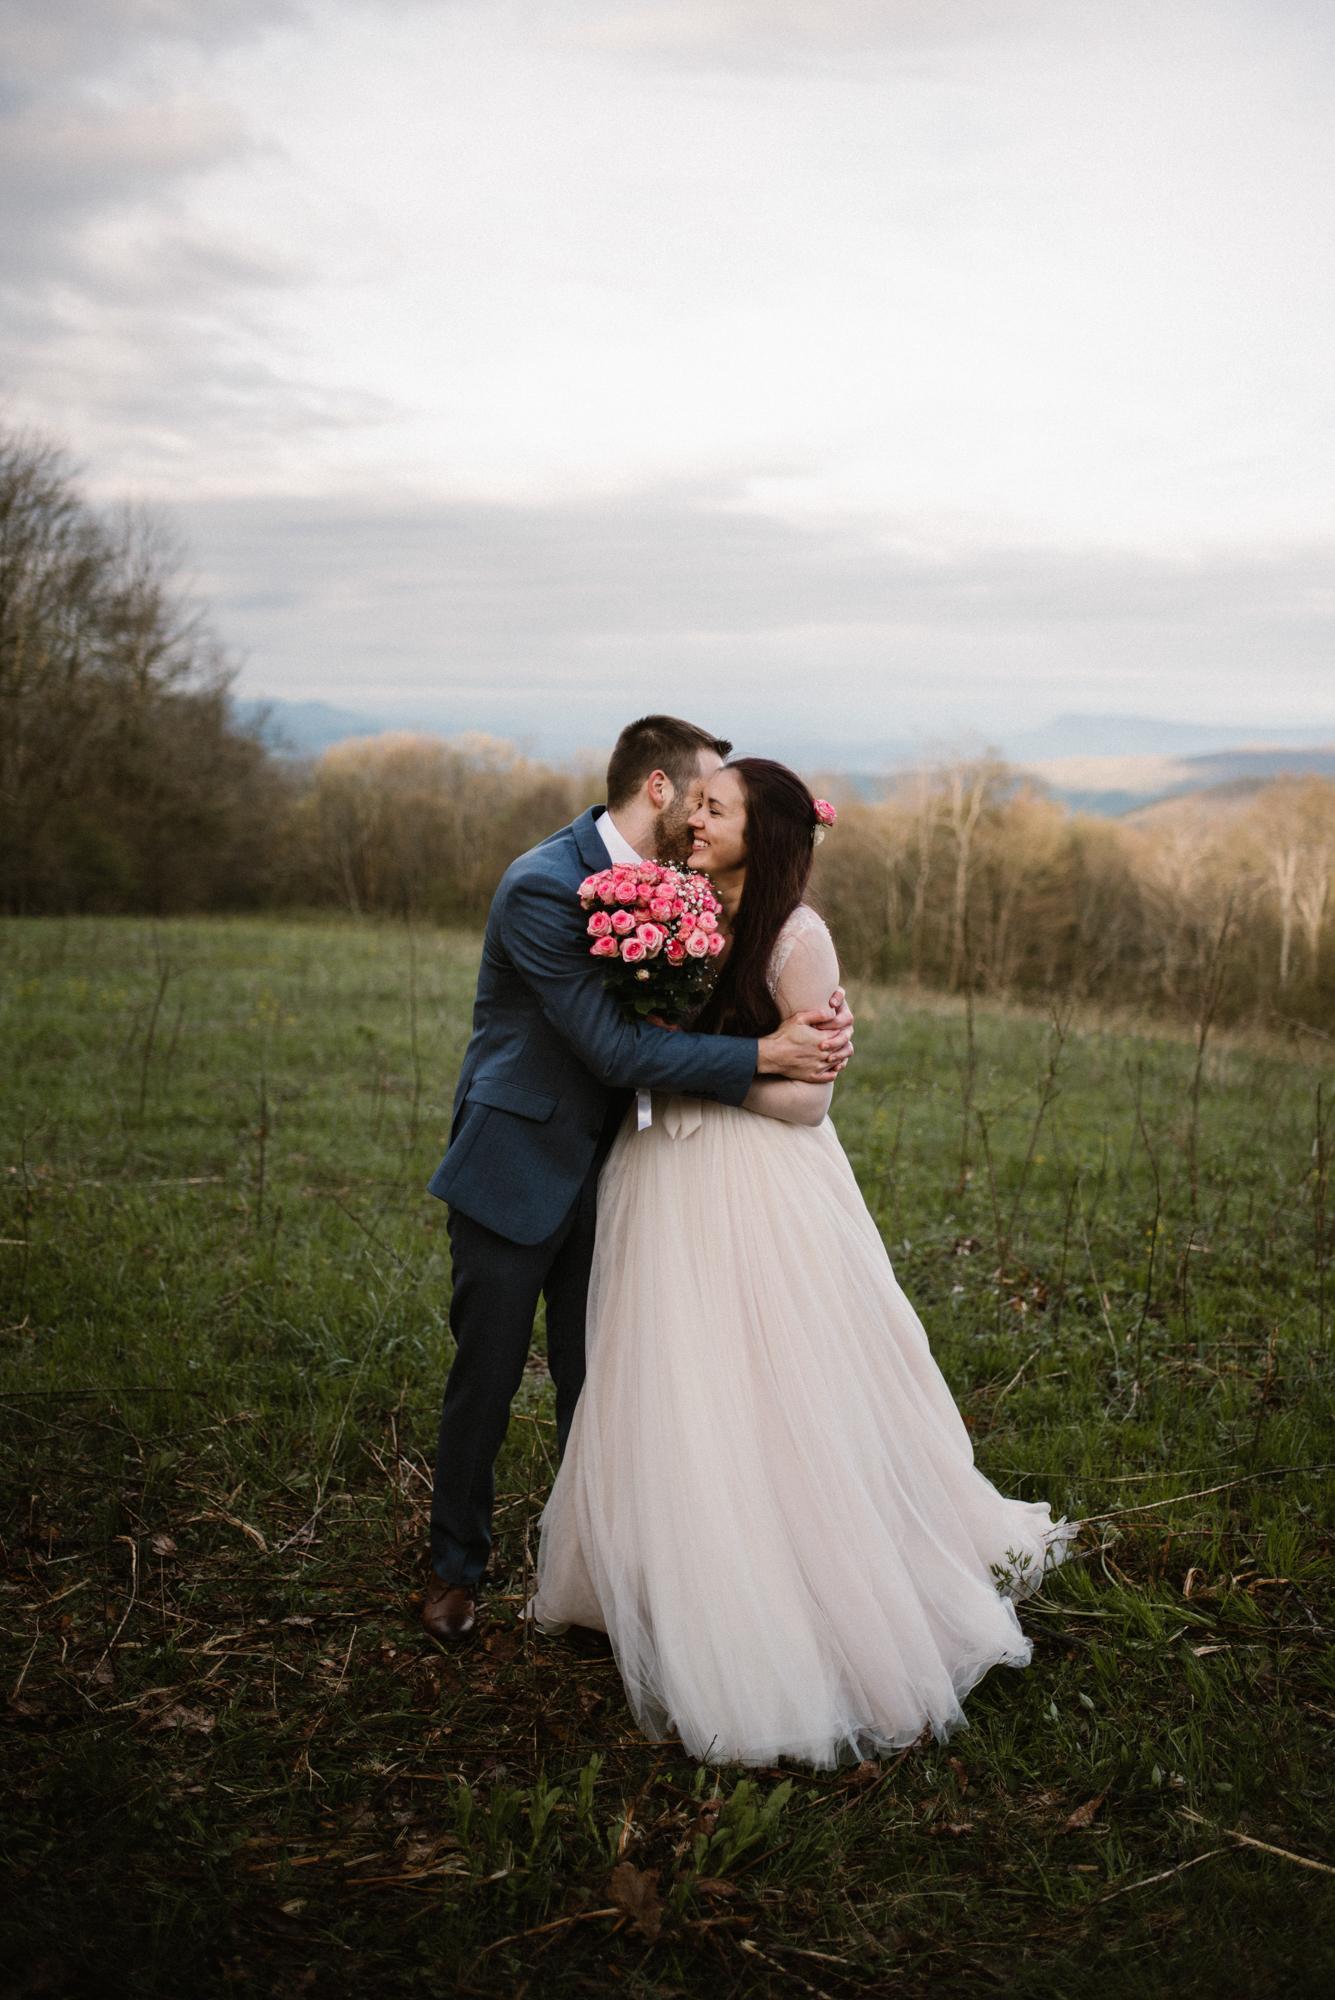 Paula and Andrew - Small Adventurous Wedding in Shenandoah National Park - Blue Ridge Mountain Wedding - White Sails Creative - Mountain Elopement_28.jpg